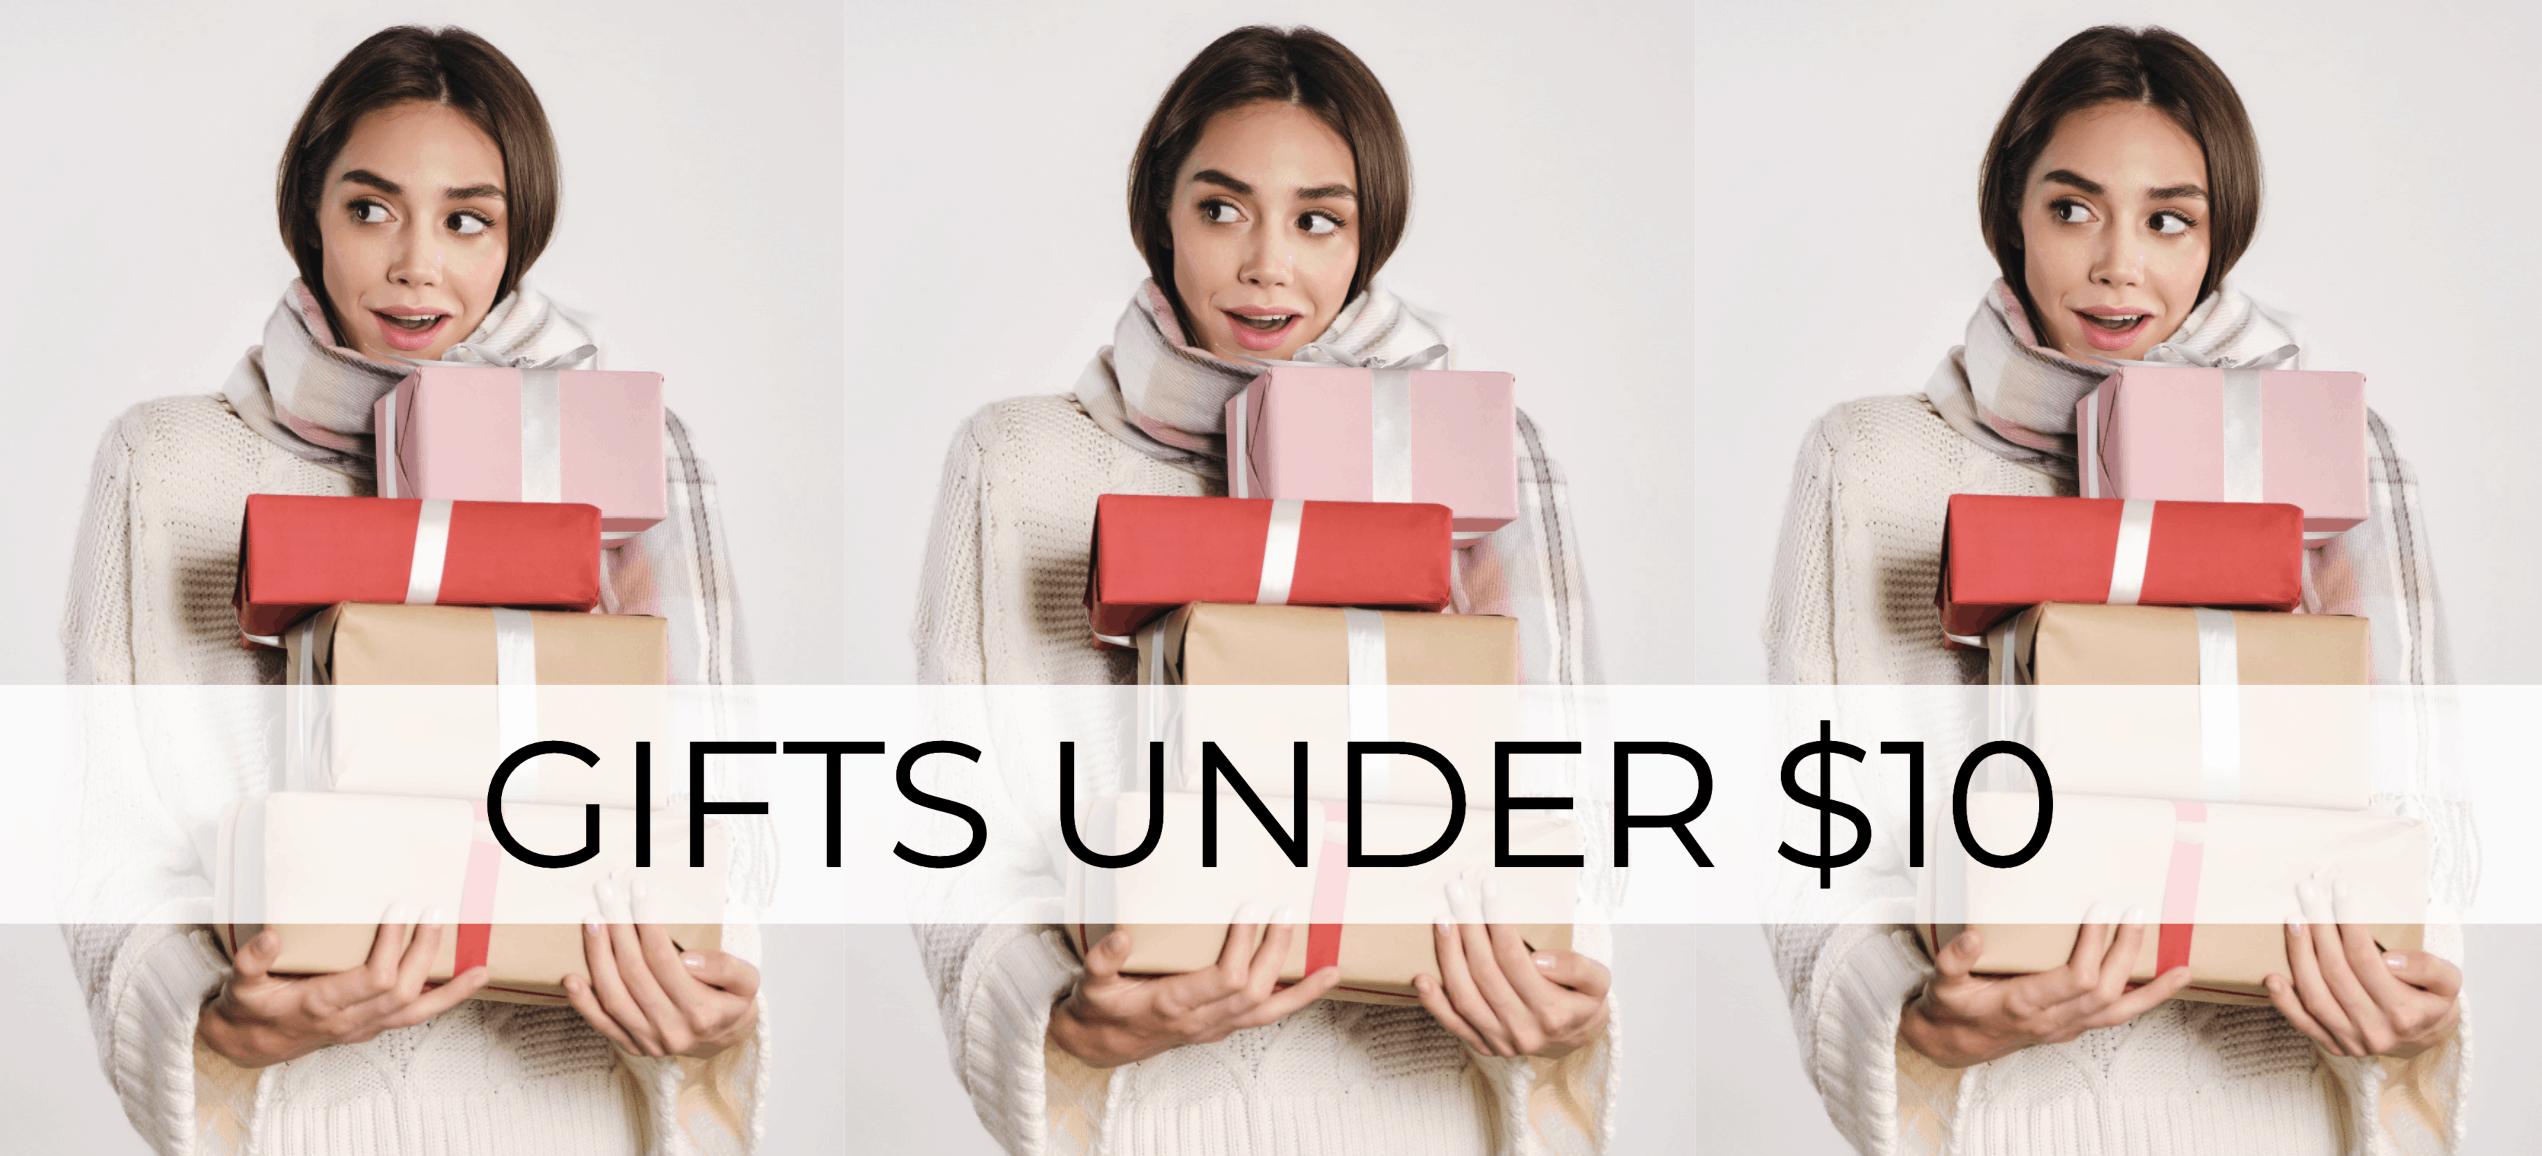 gifts under 10